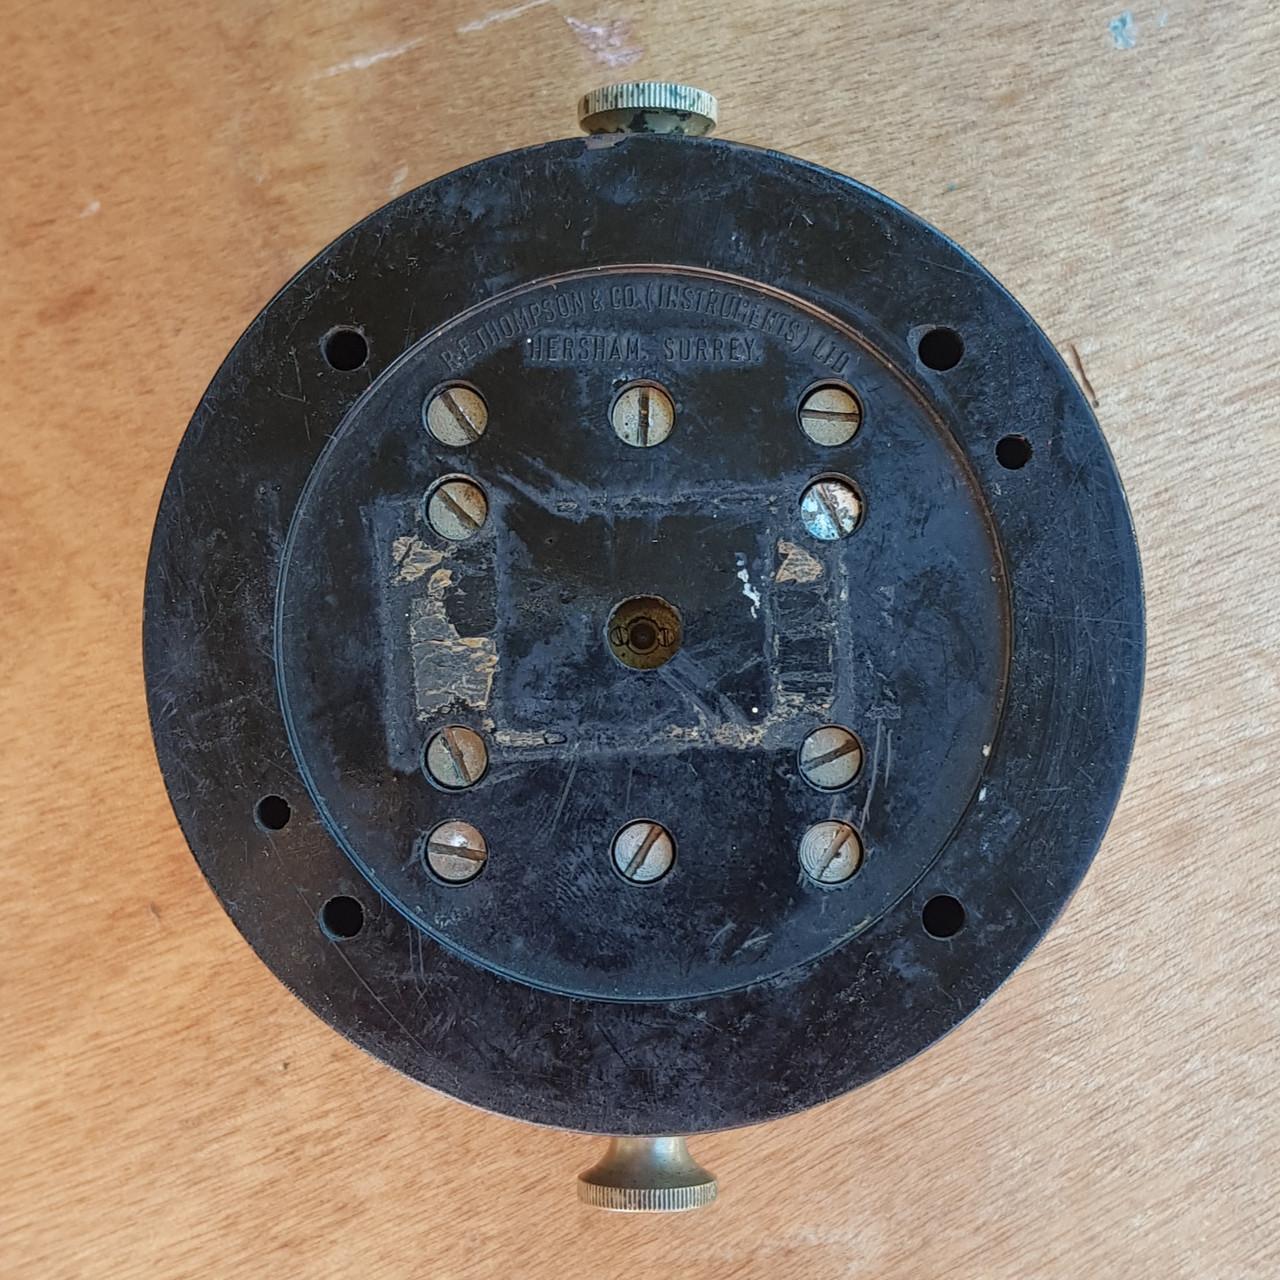 VT 4114. BR WR  BAKELITE TRACK CIRCUIT INDICATOR BY R.E.THOMPSON.